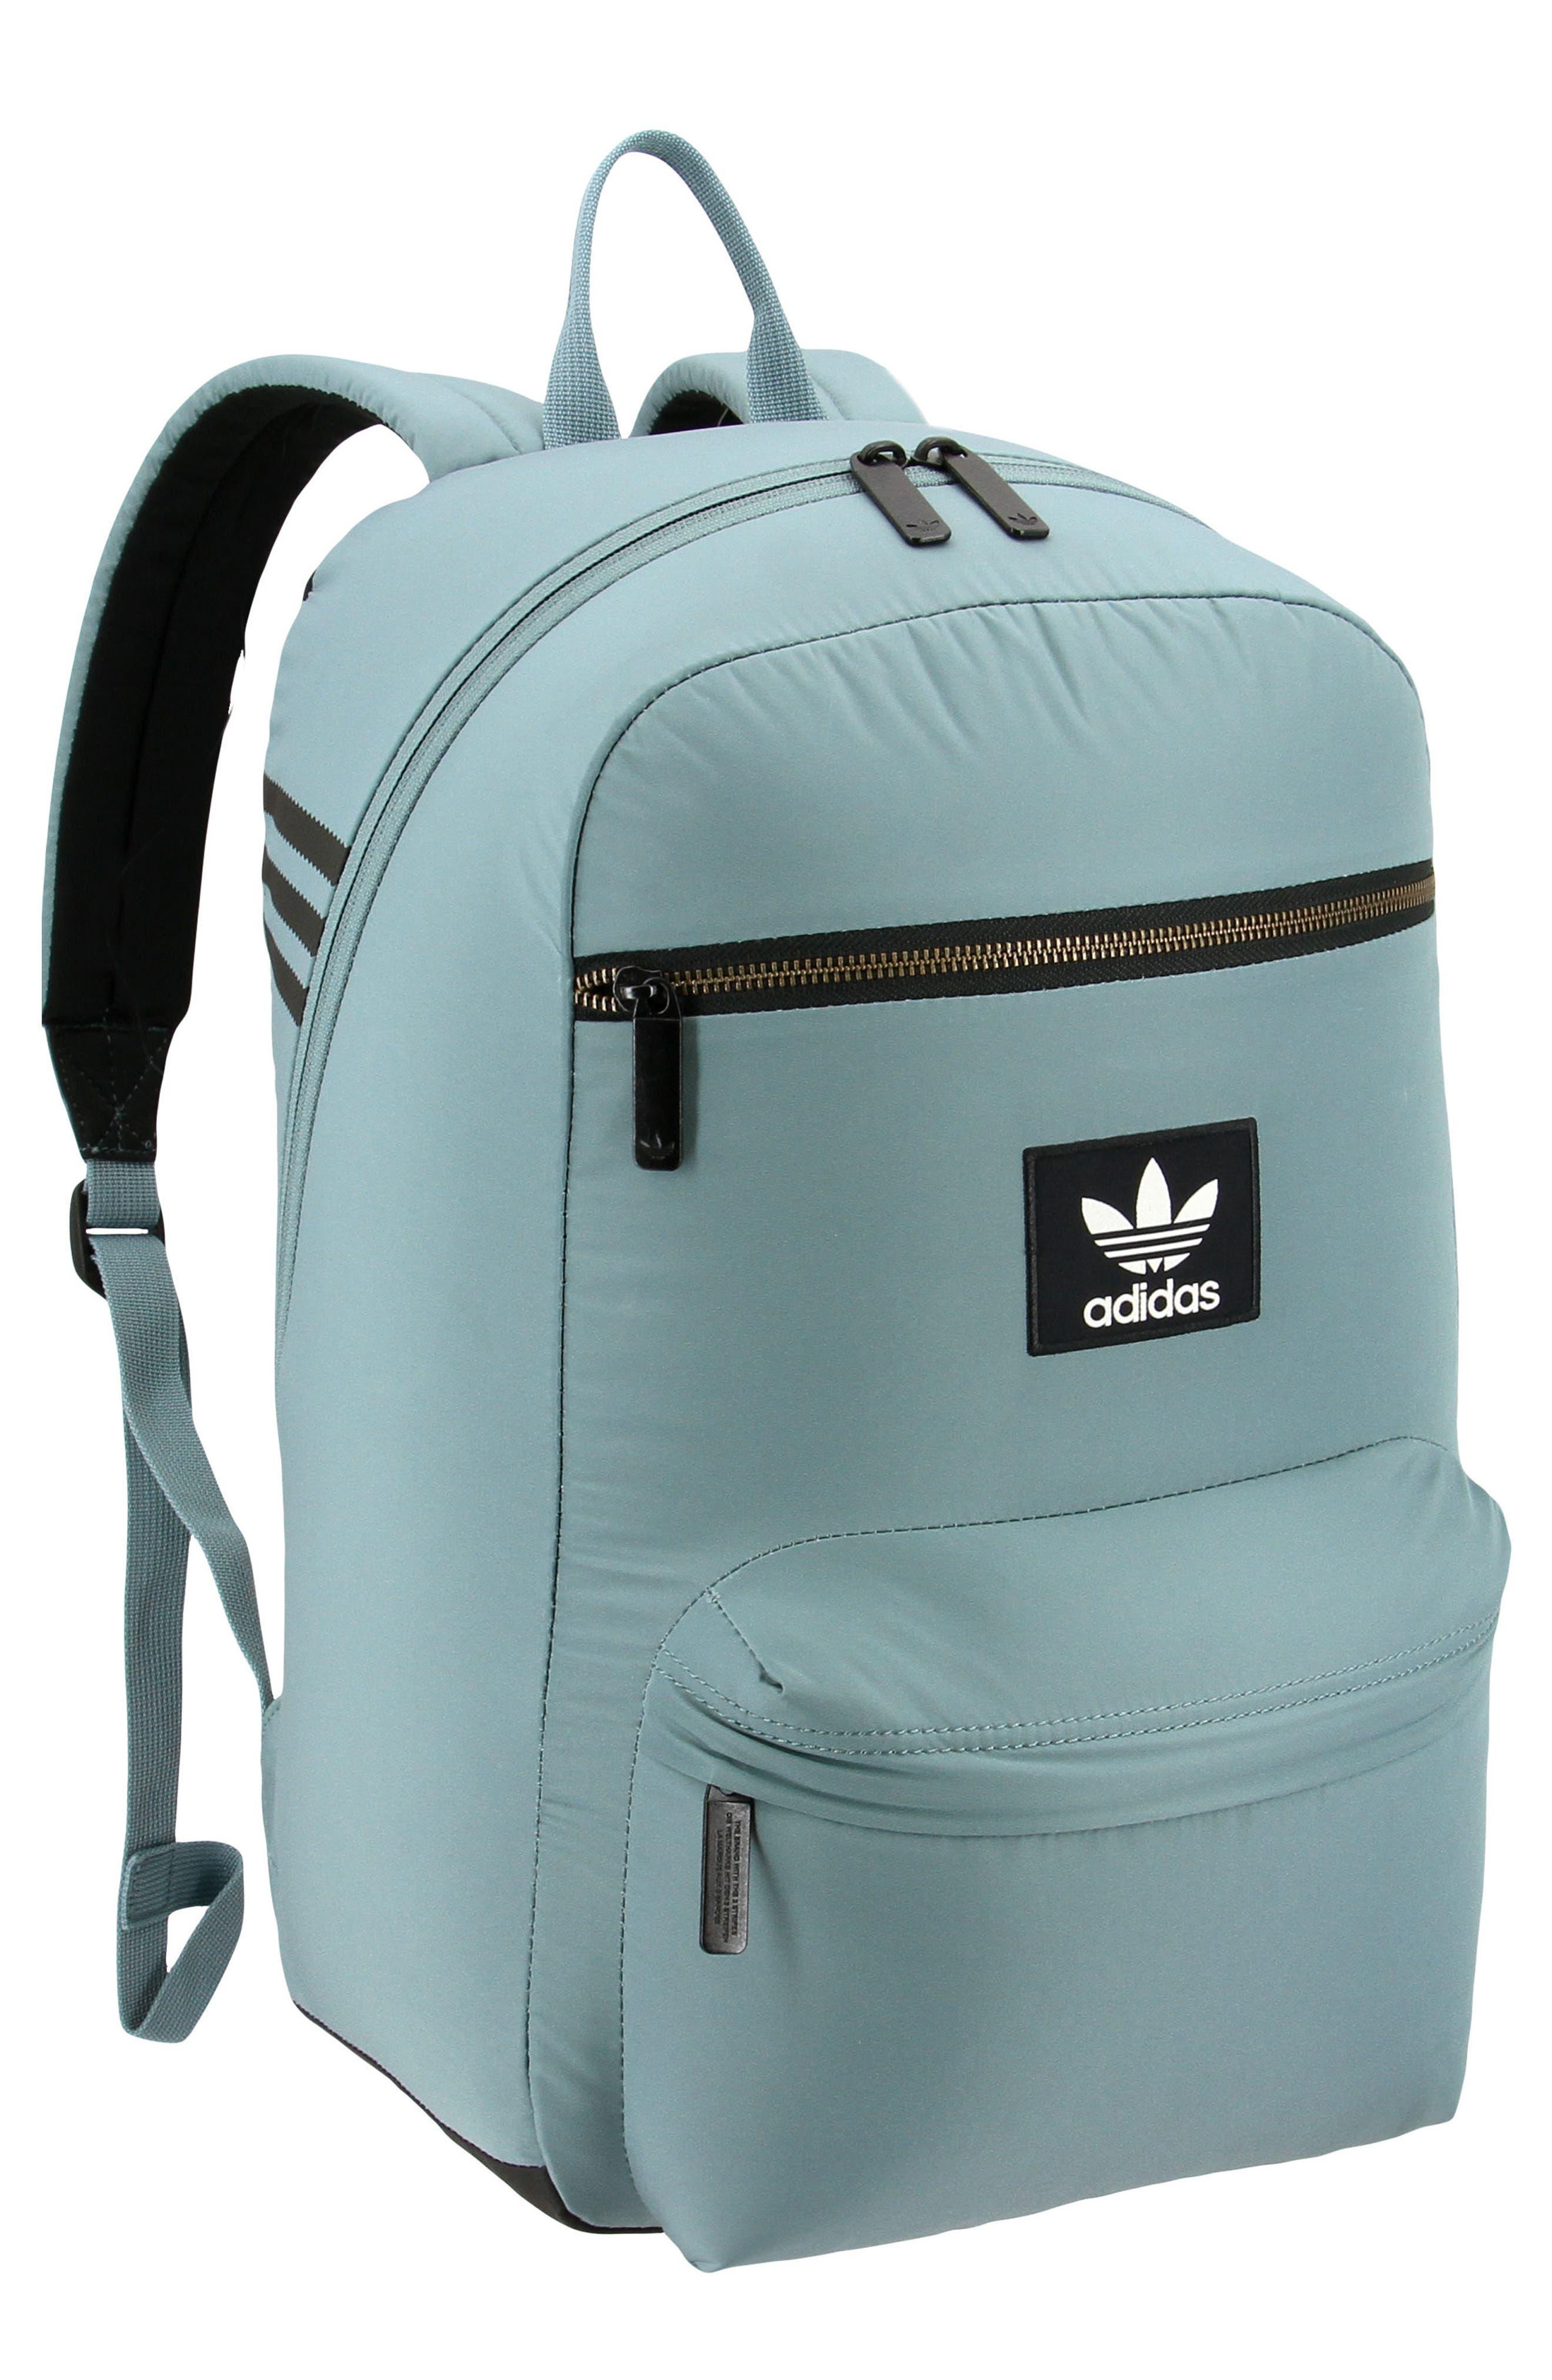 ADIDAS ORIGINALS National Plus Backpack, Main, color, RAW GREEN